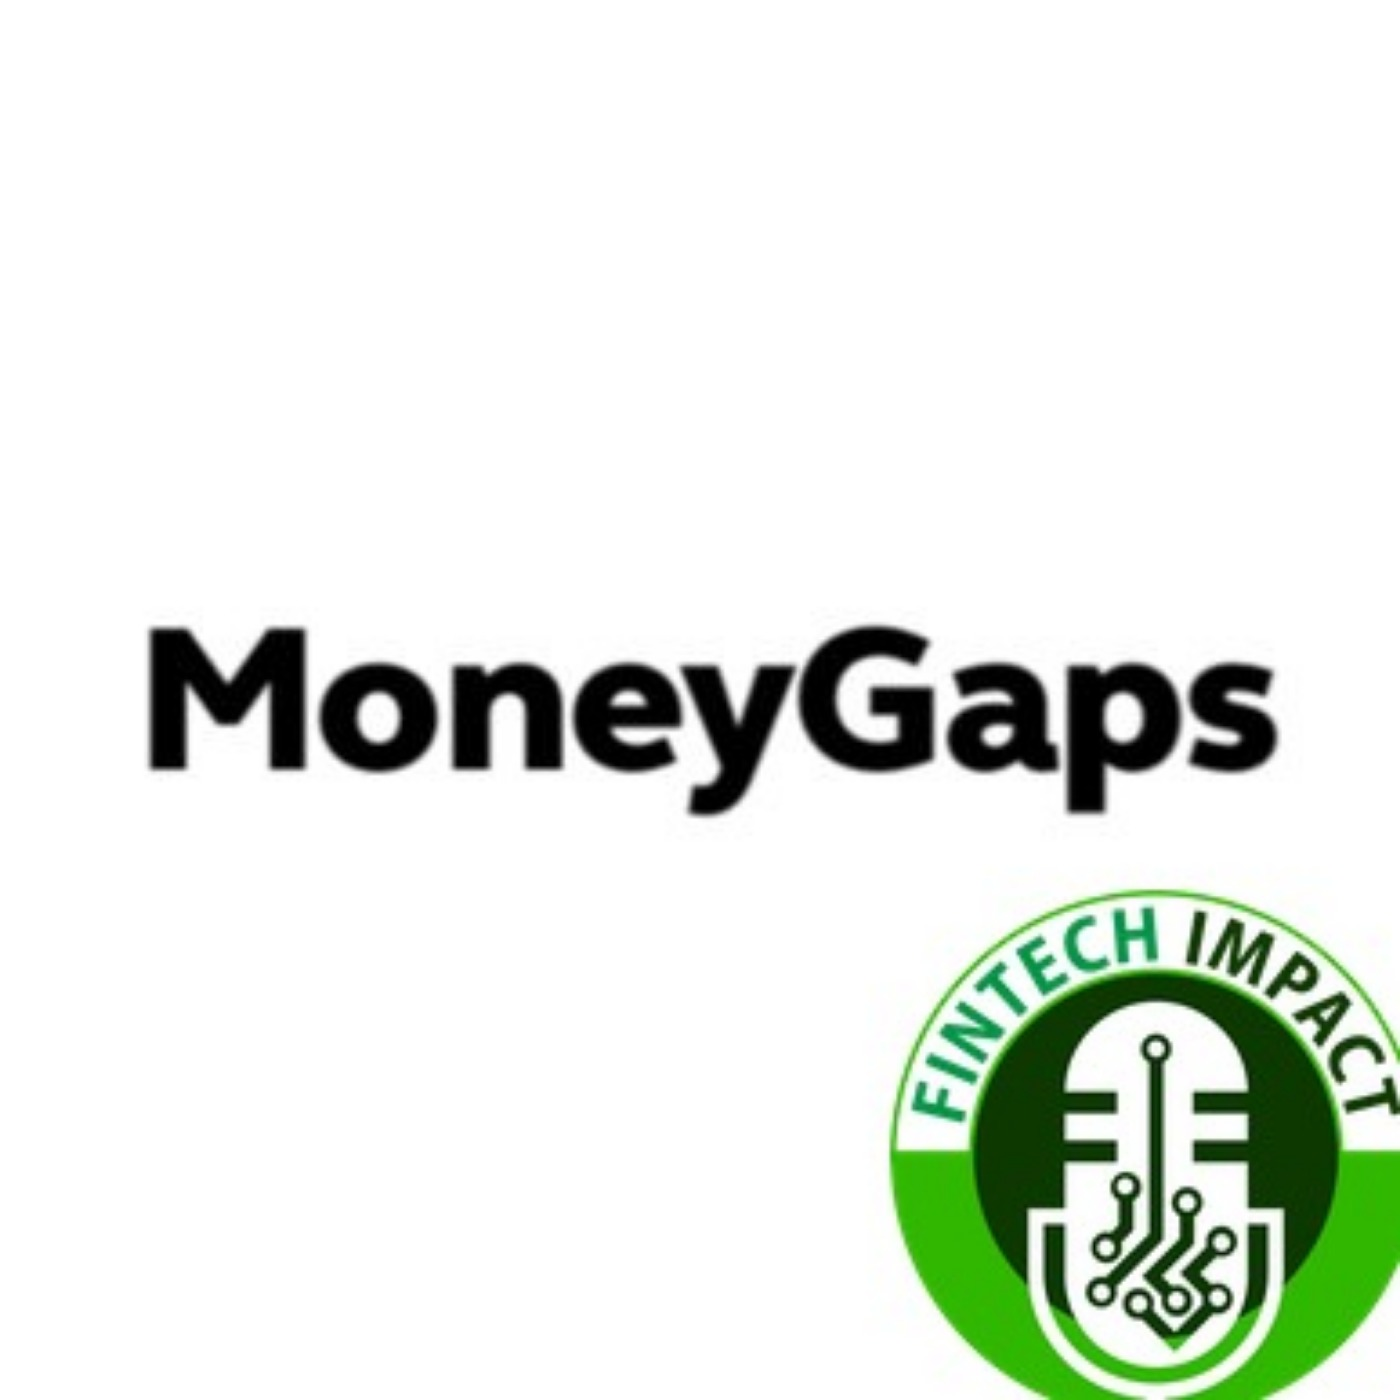 MoneyGaps with Preet Banerjee (Founder) | E77